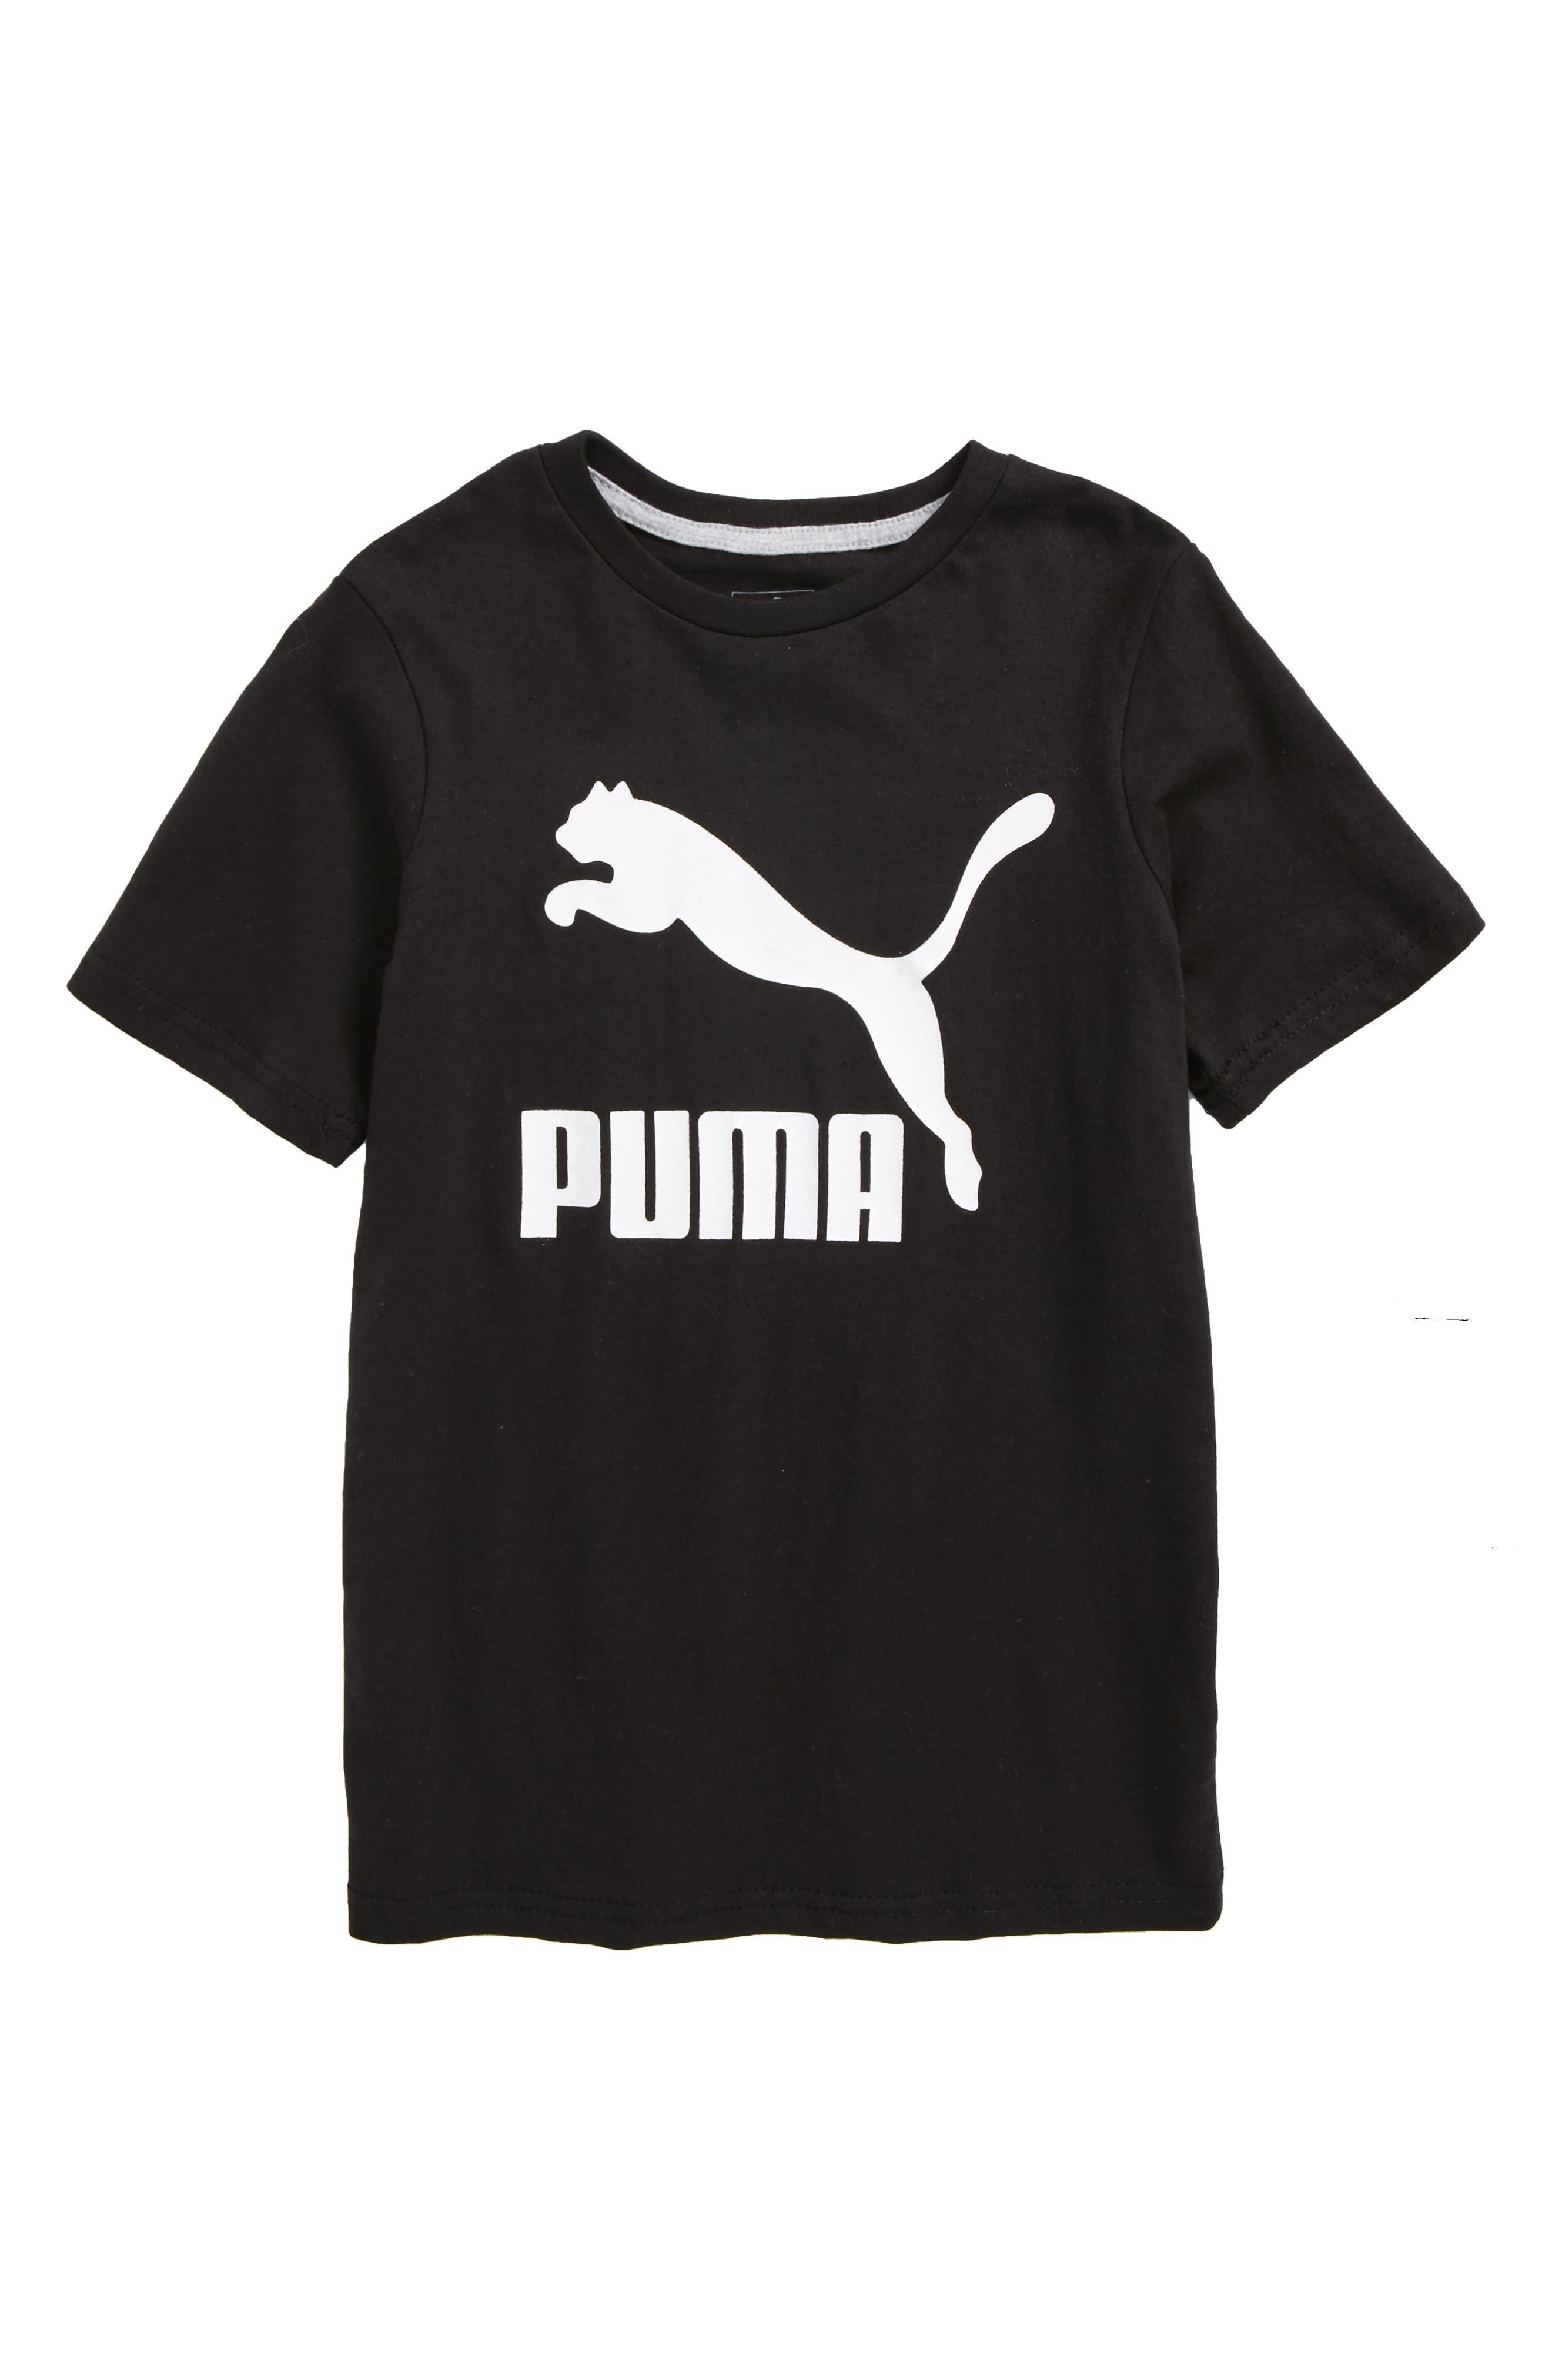 PUMA Archive Logo Graphic T-Shirt (Big Boys)